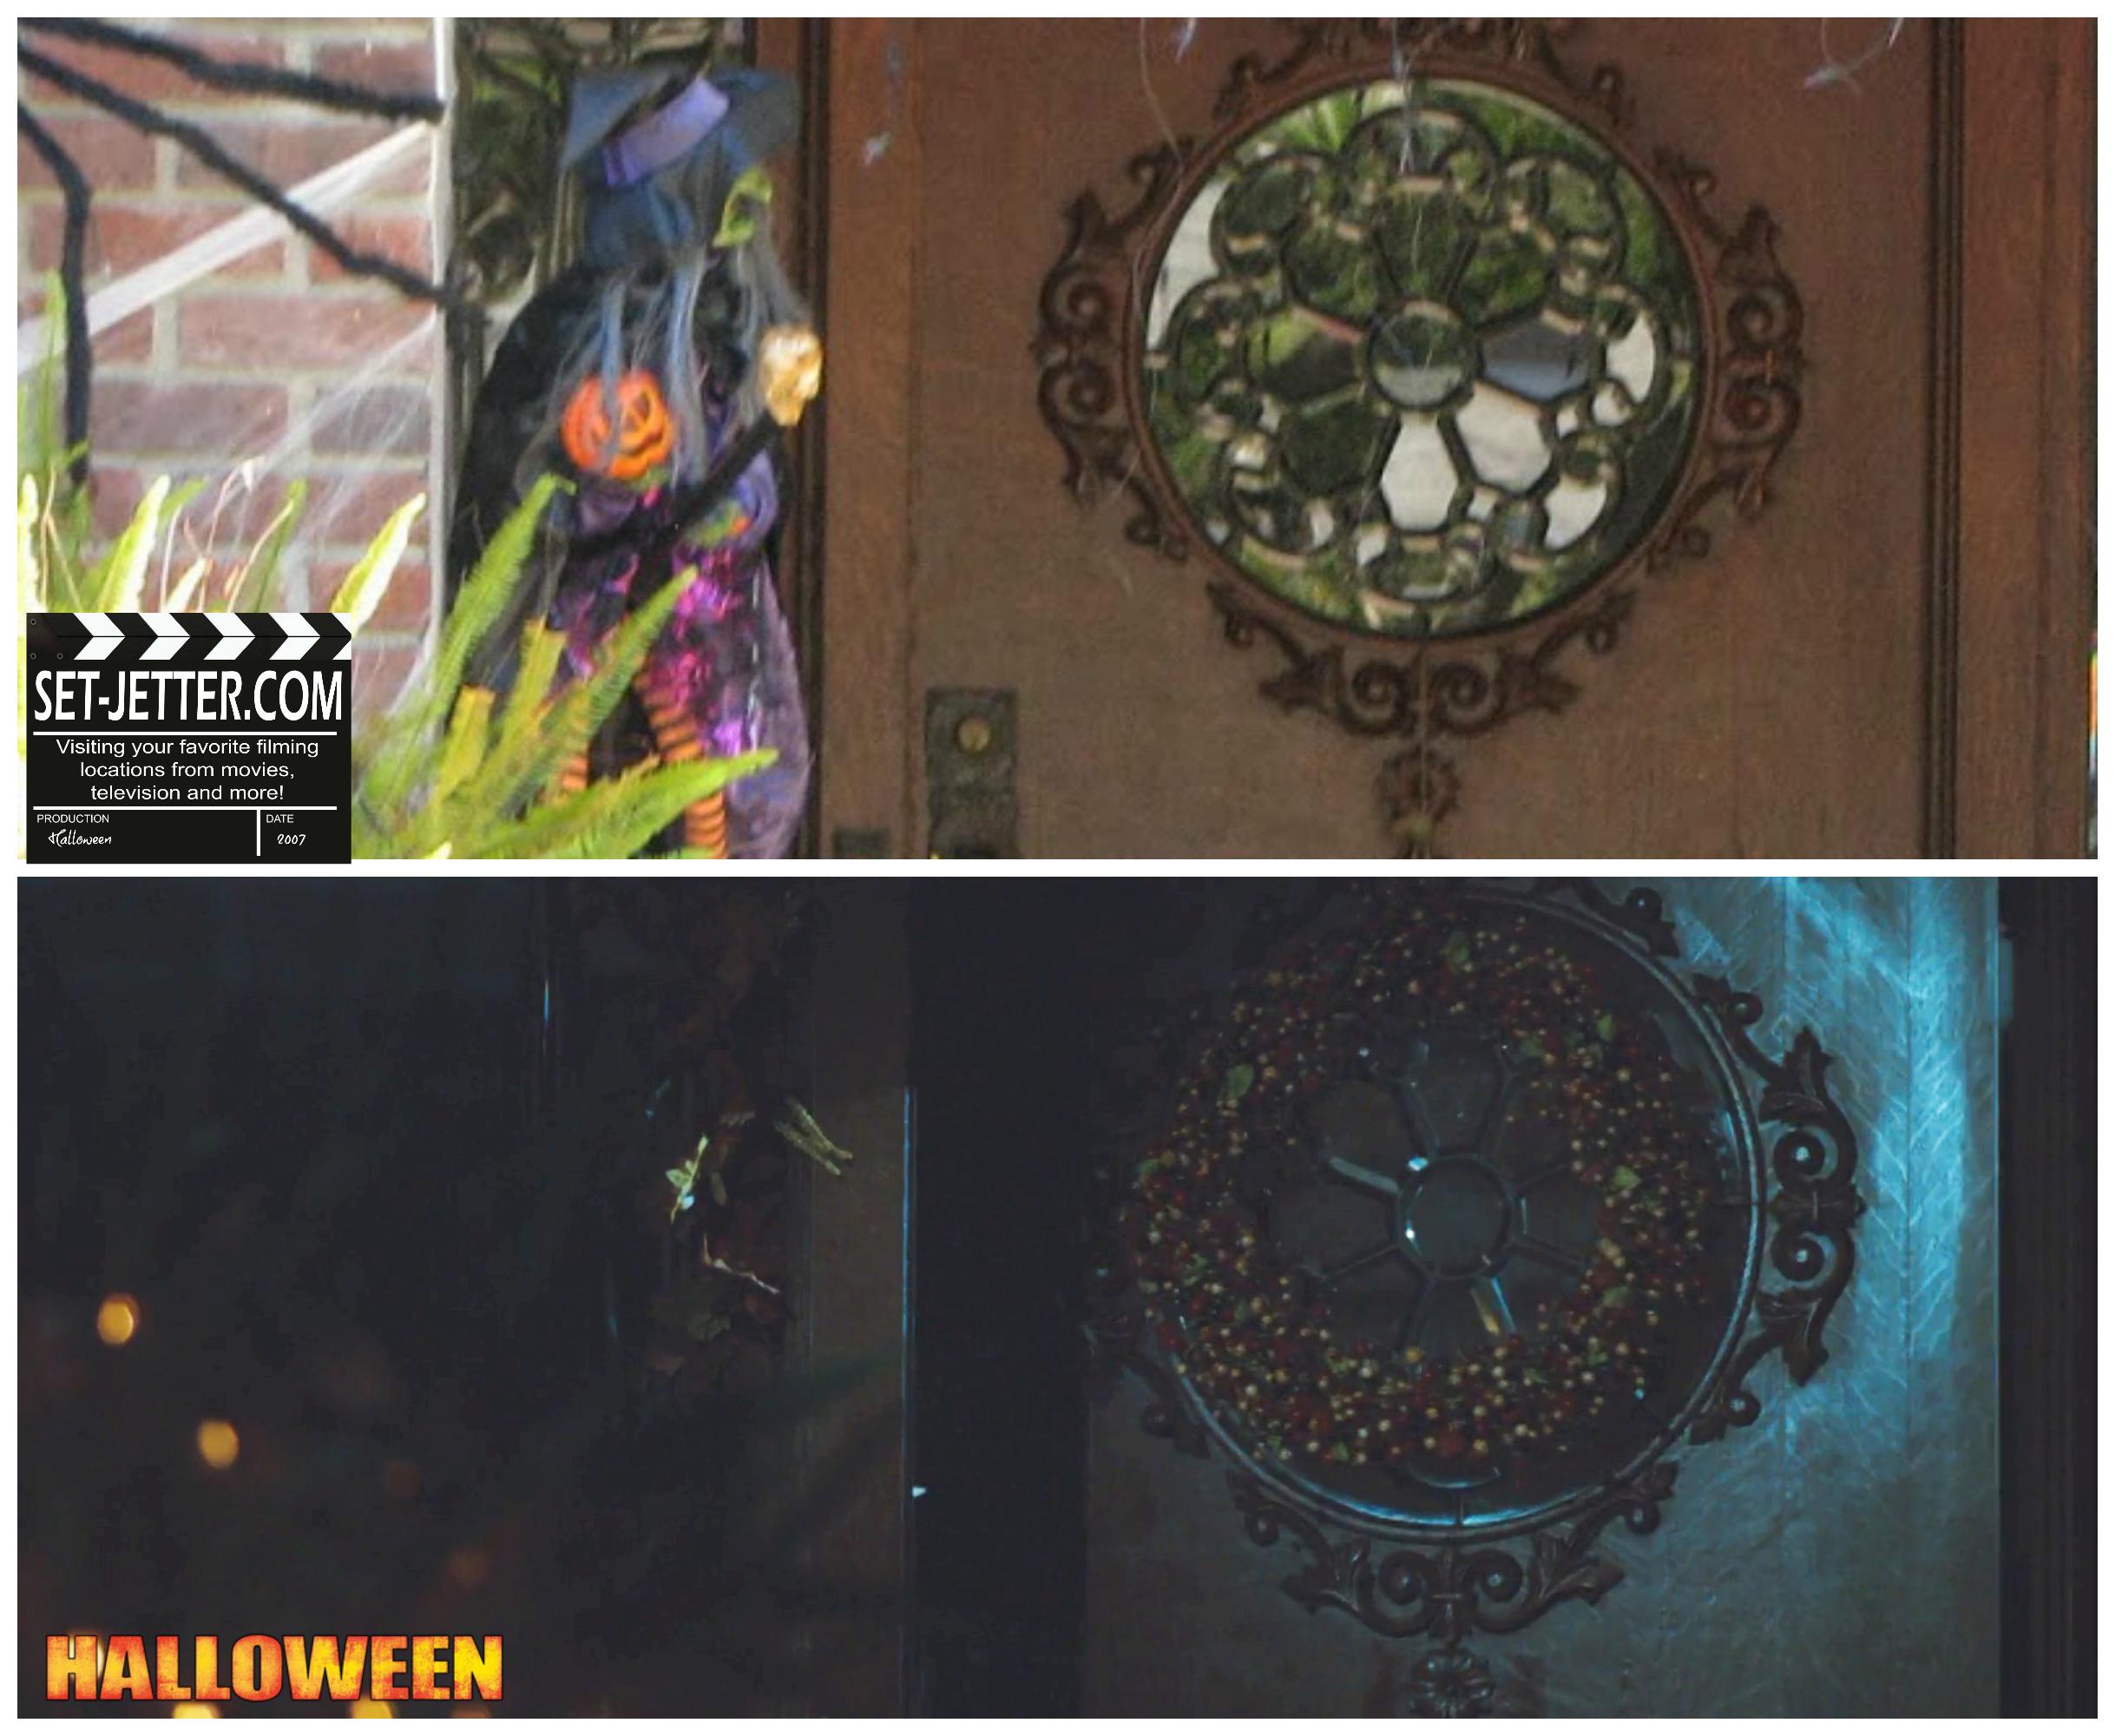 Halloween 2007 comparison 65.jpg